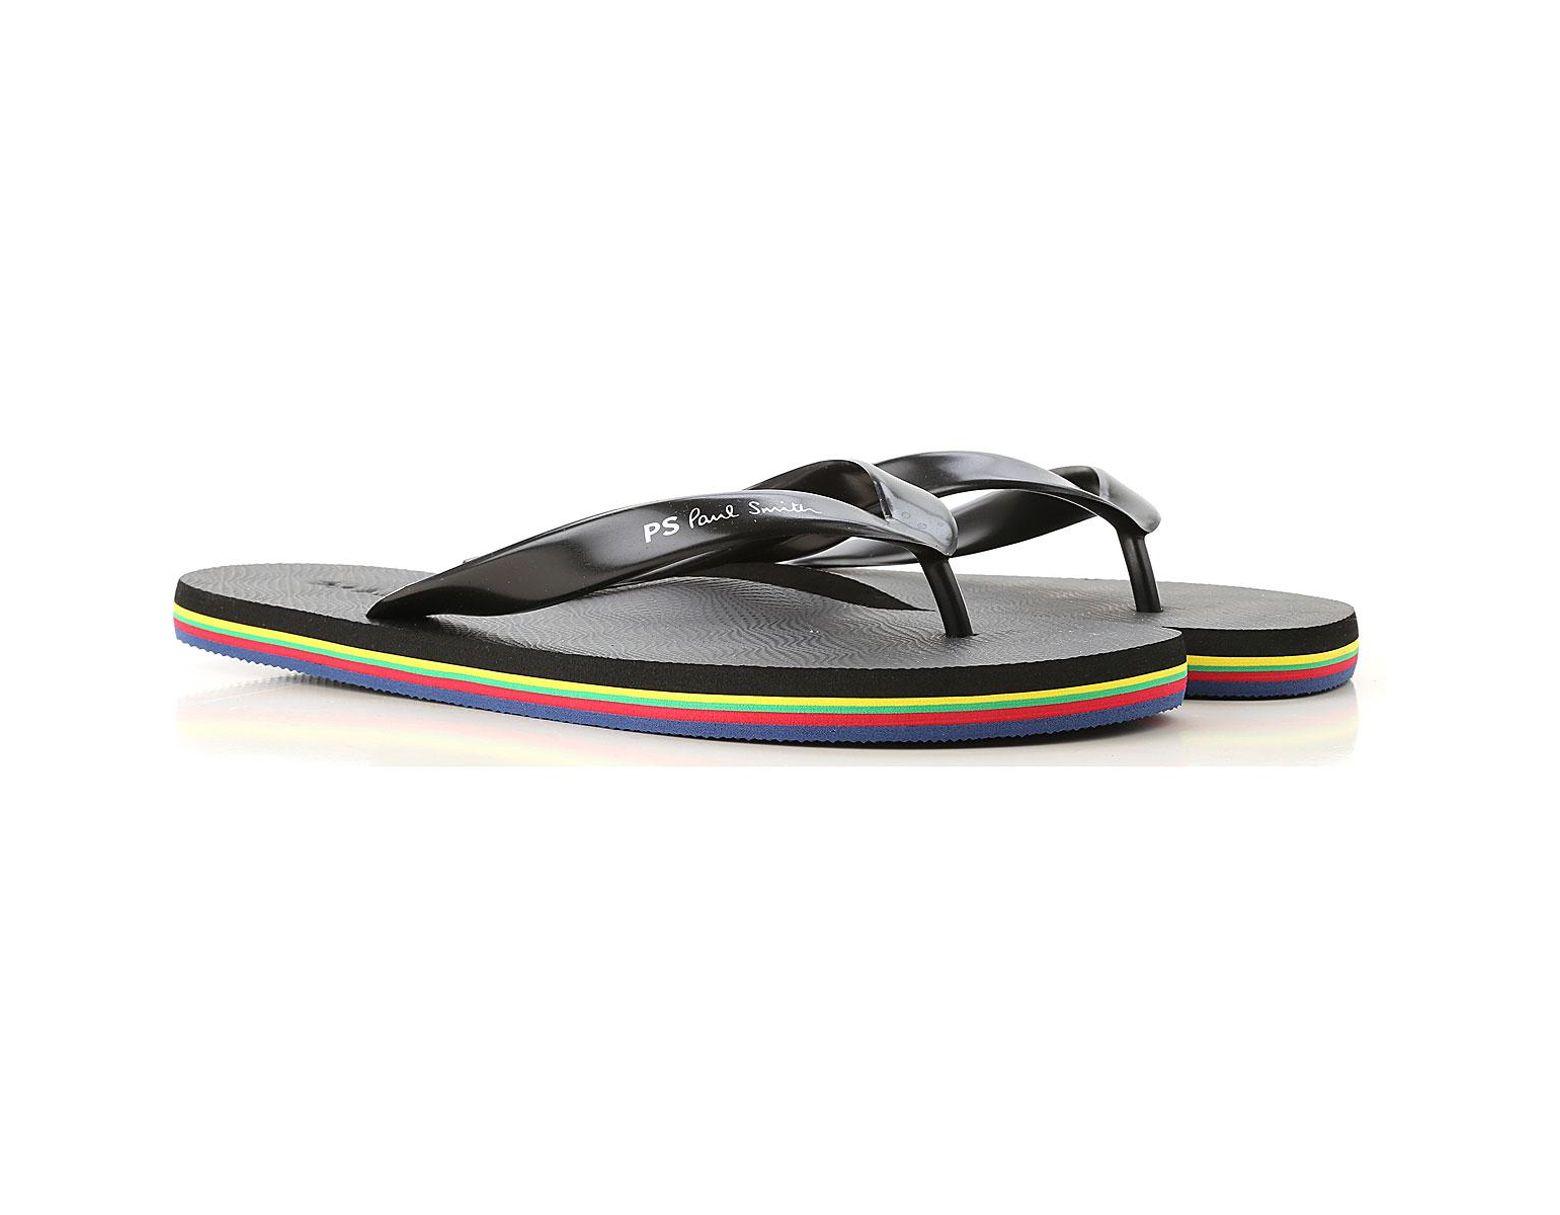 5515c5de4 Paul Smith Shoes For Men in Black for Men - Lyst